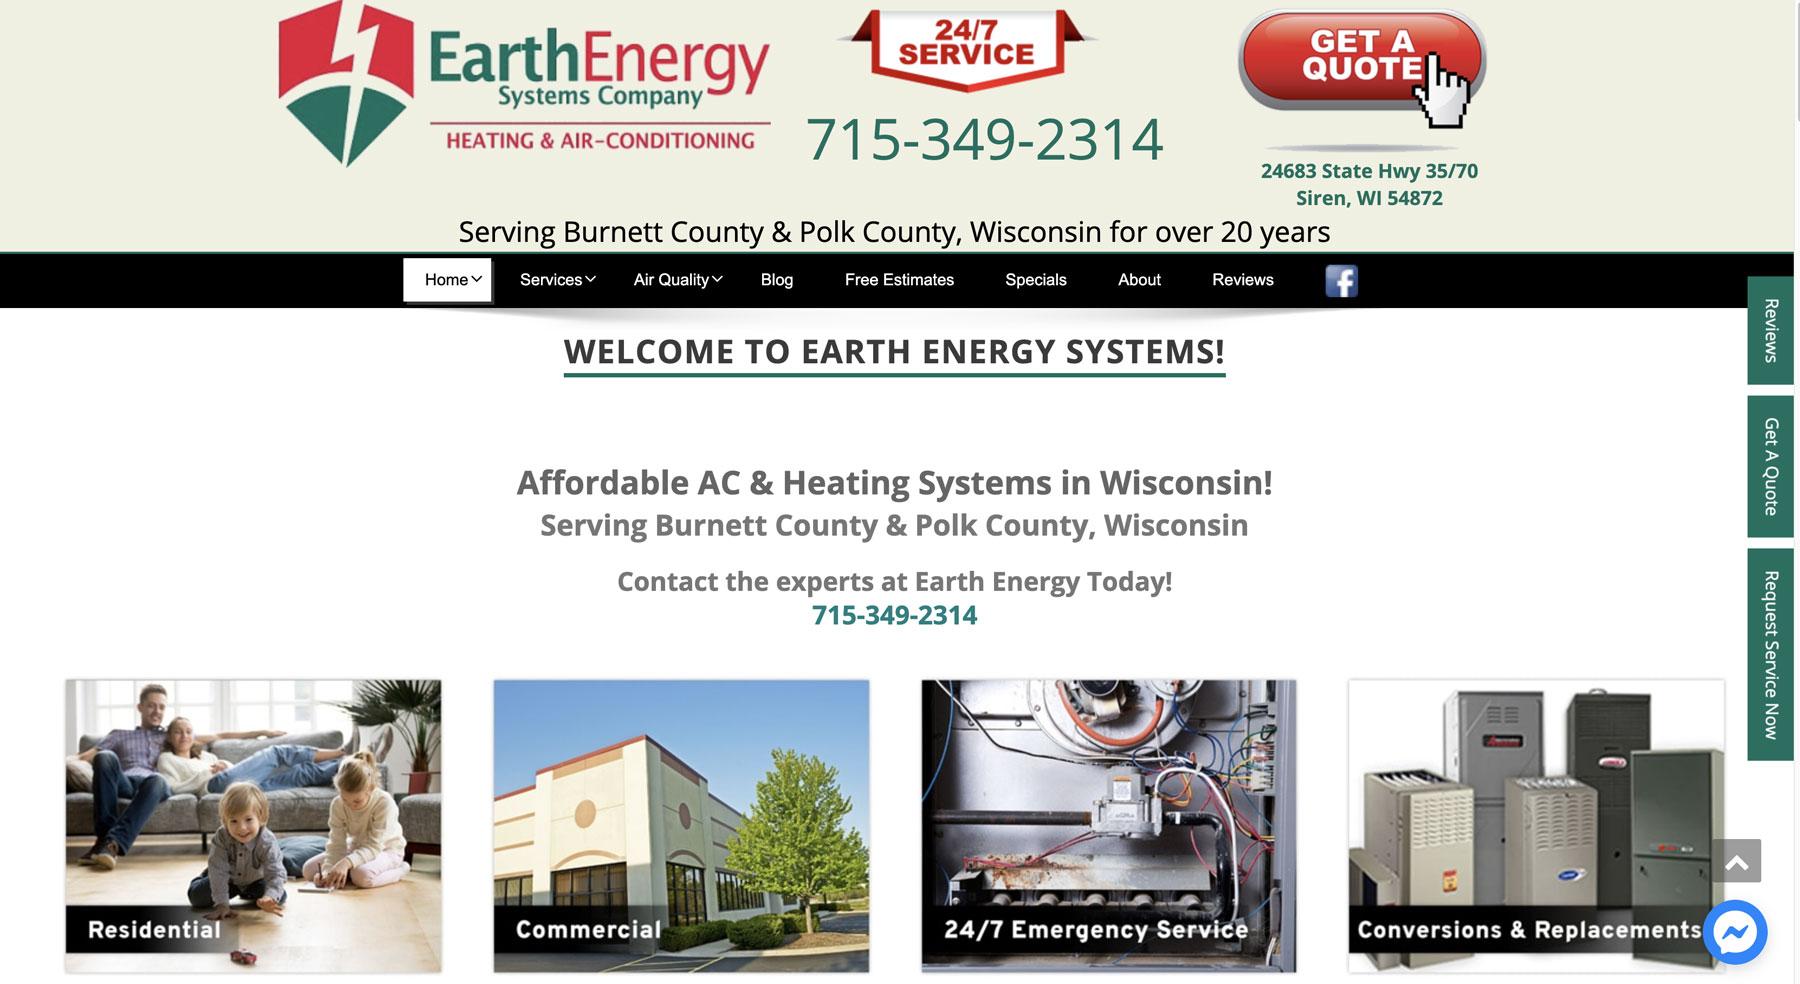 Website Design for Earth Energy in Siren, WI